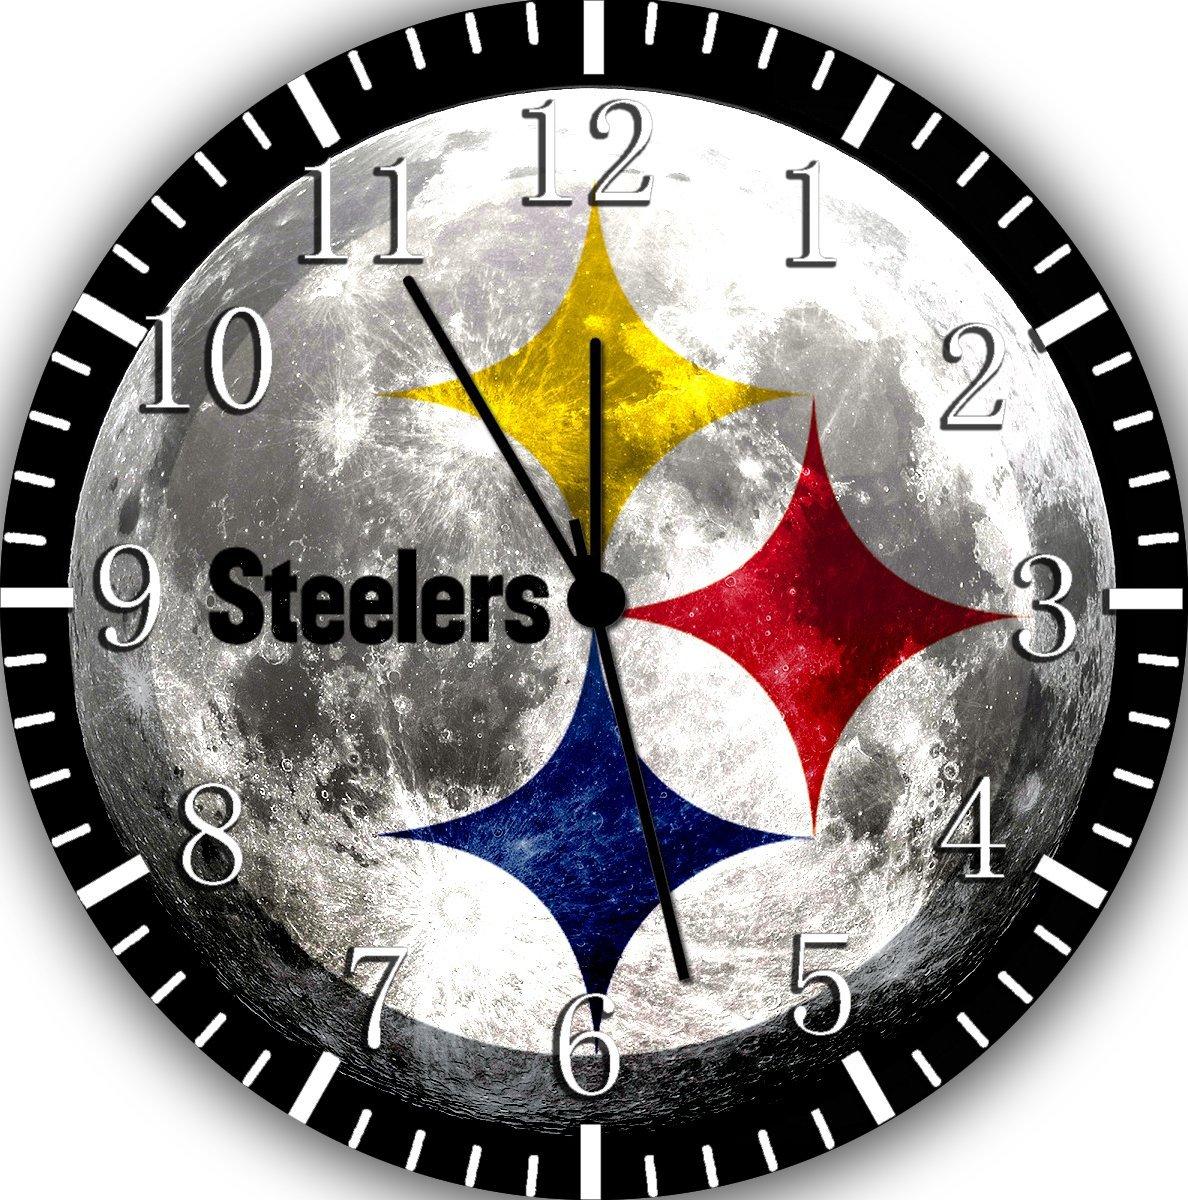 Steelers Frameless Borderless Wall Clock F36 Nice For Gift or Room Wall Decor